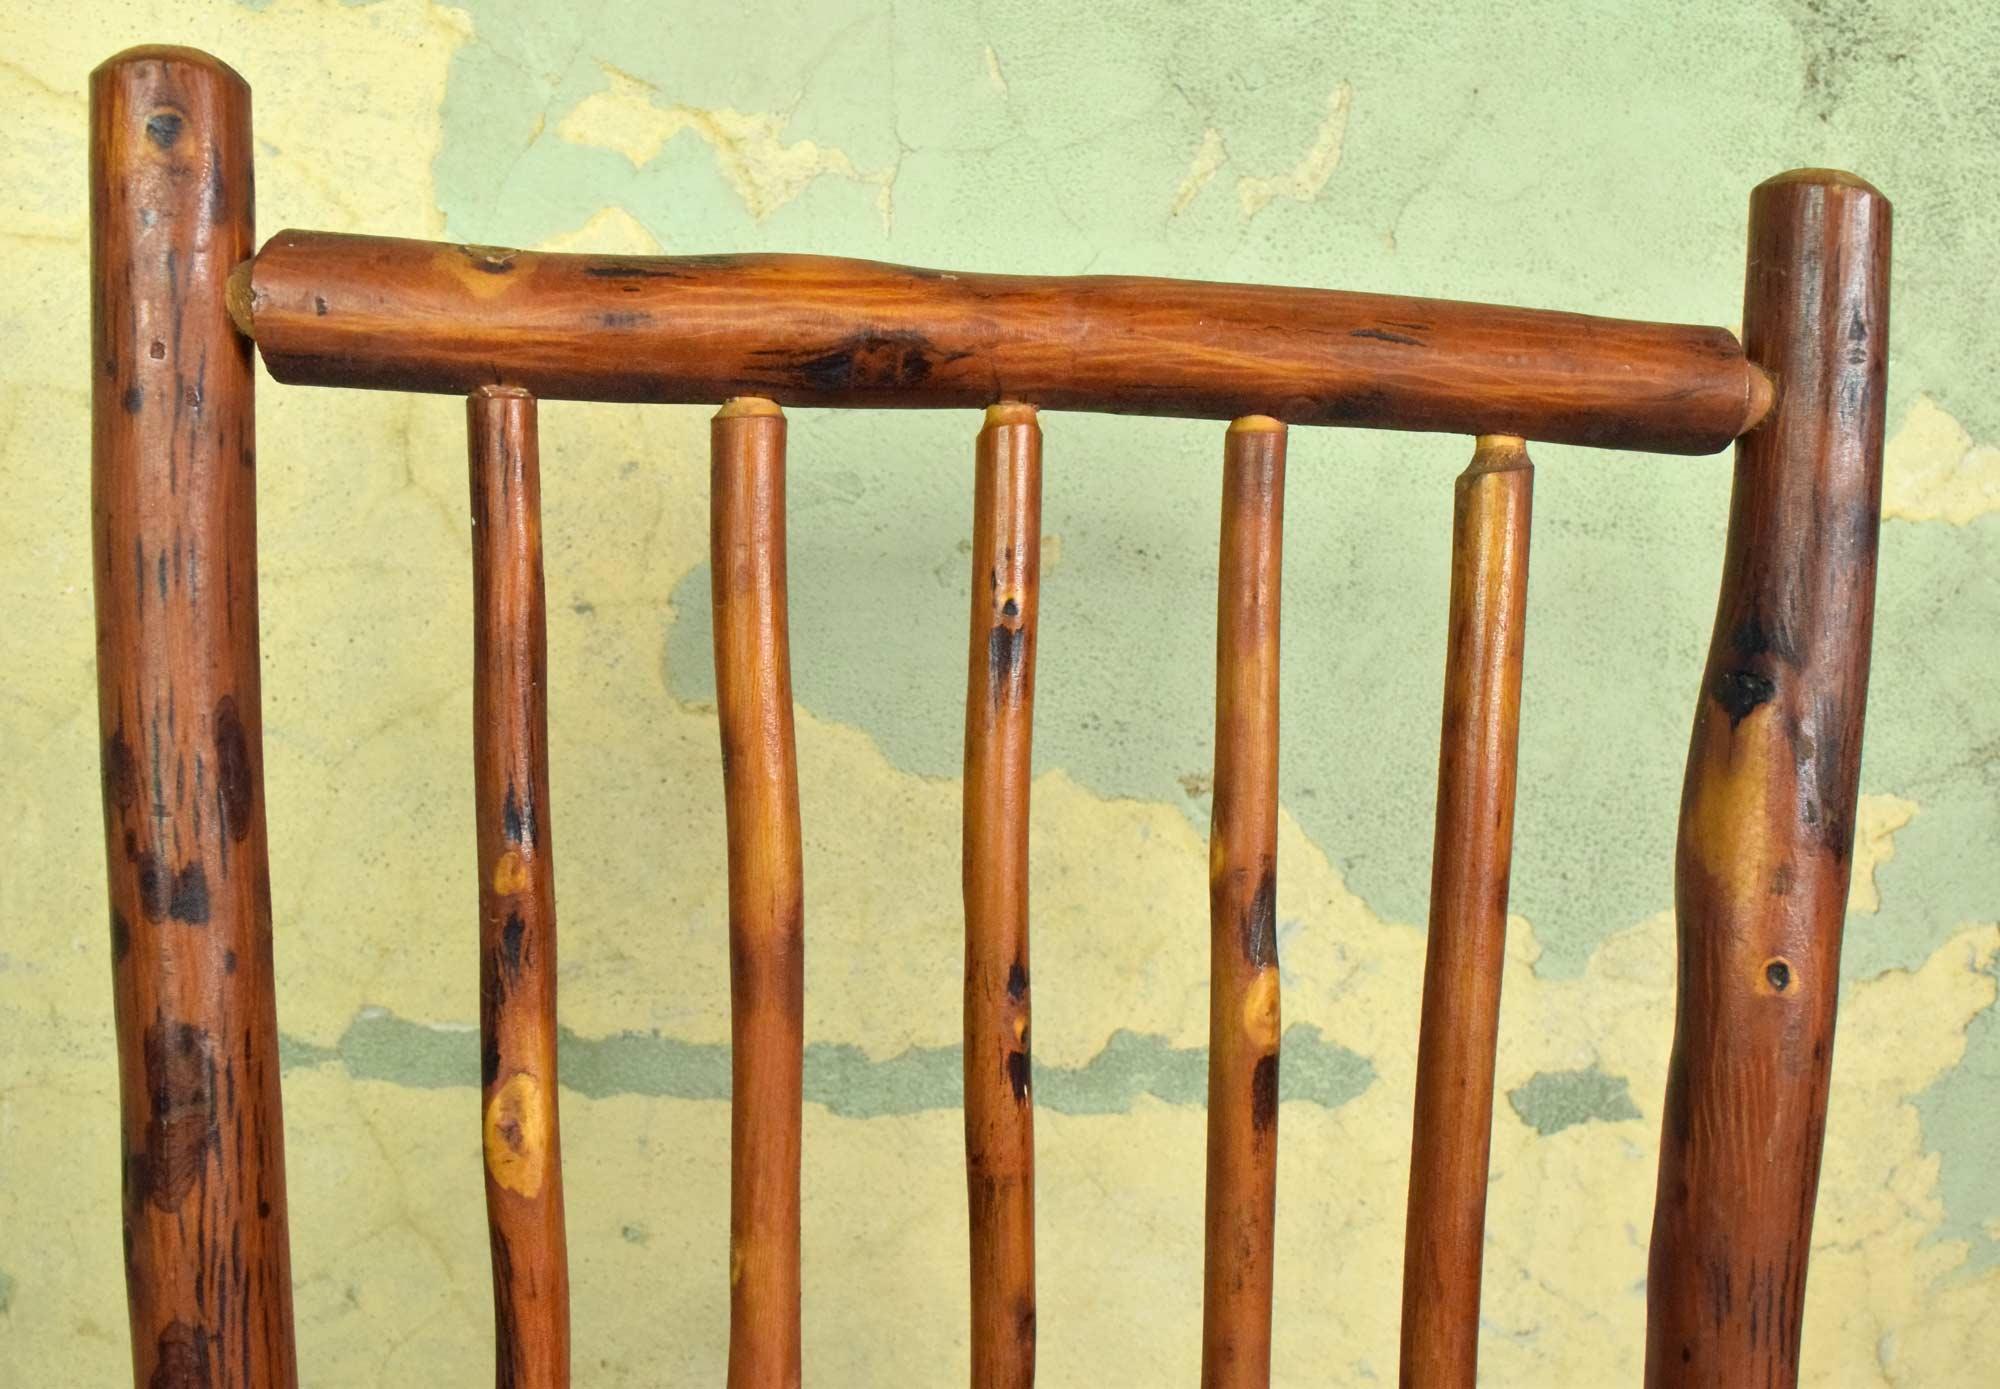 46894-hickory-chair-set-back-detail.jpg